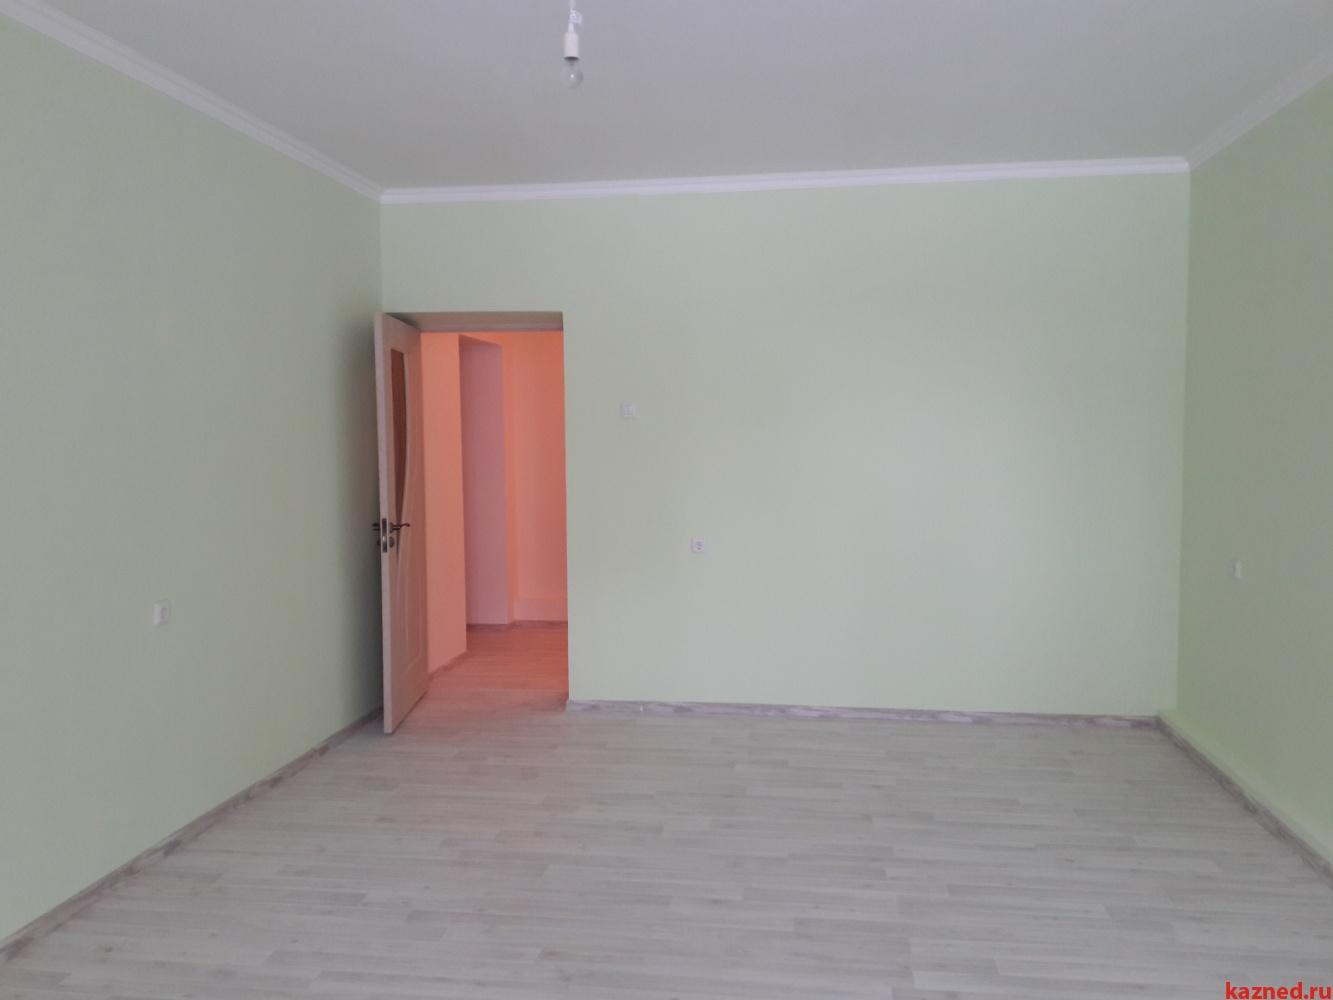 Продажа 3-к квартиры Карбышева,  67, 120 м2  (миниатюра №14)